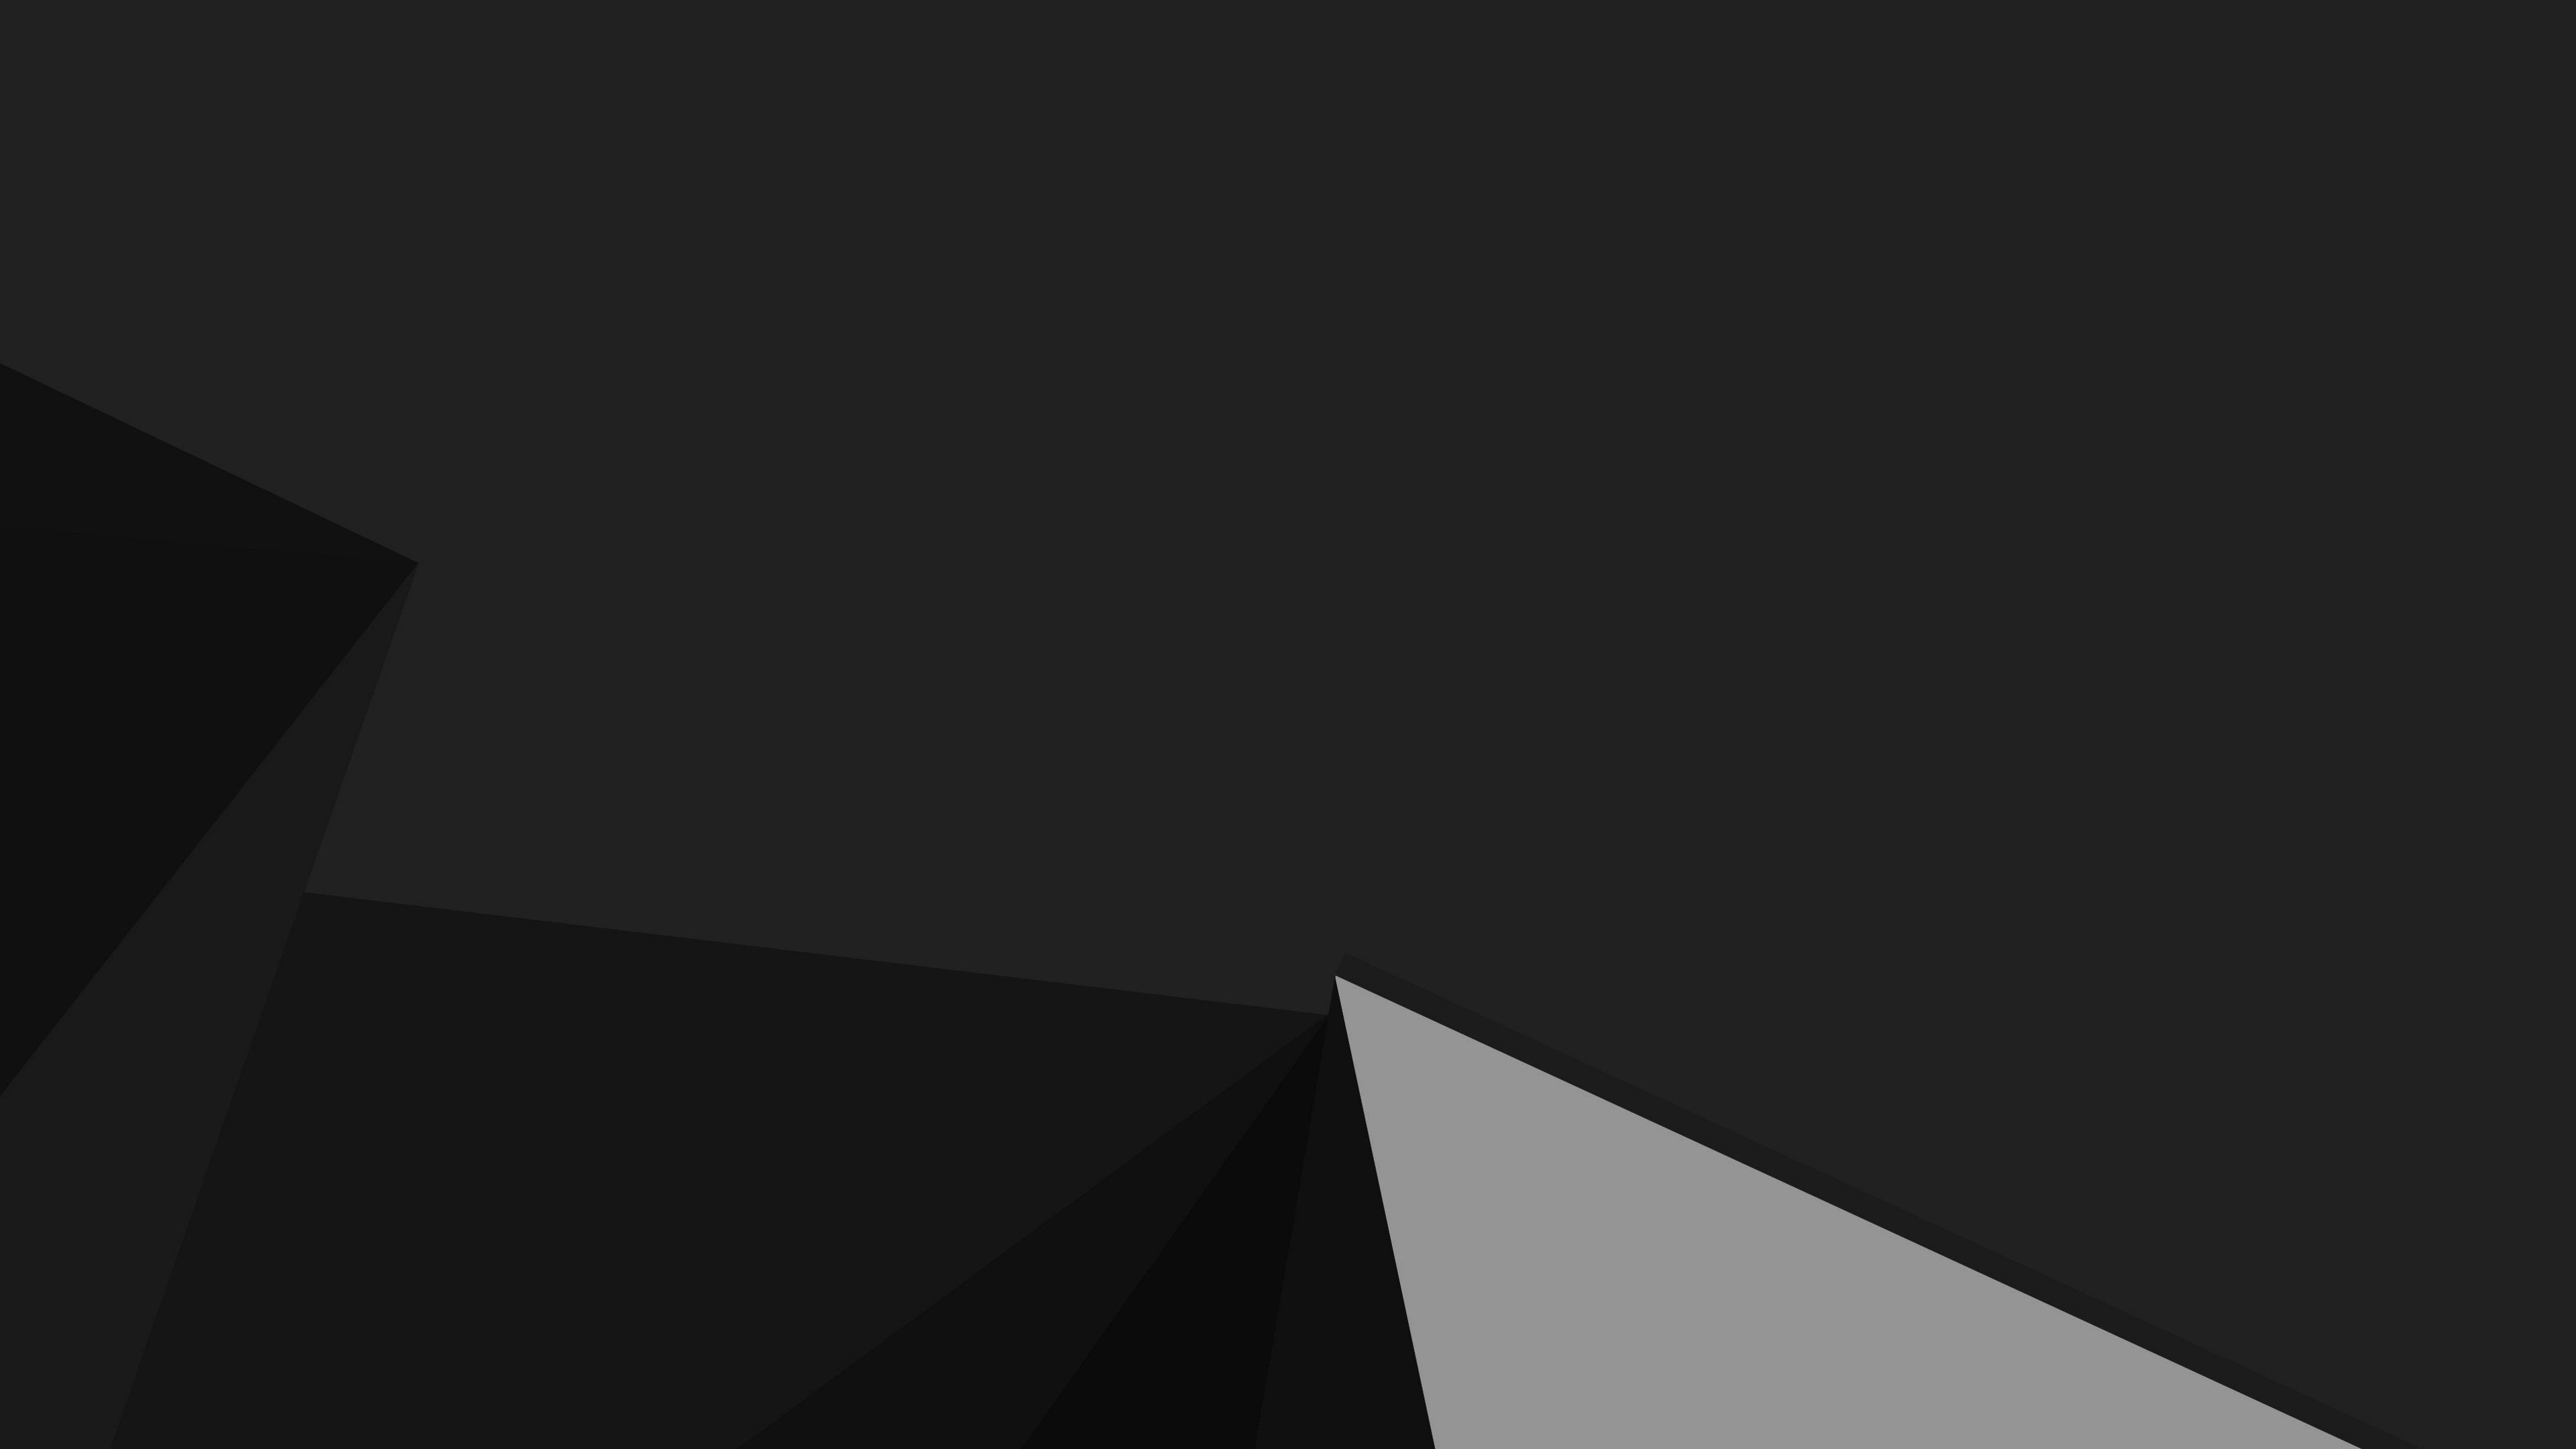 Windows Mobile Black Panorama 4K Wallpaper